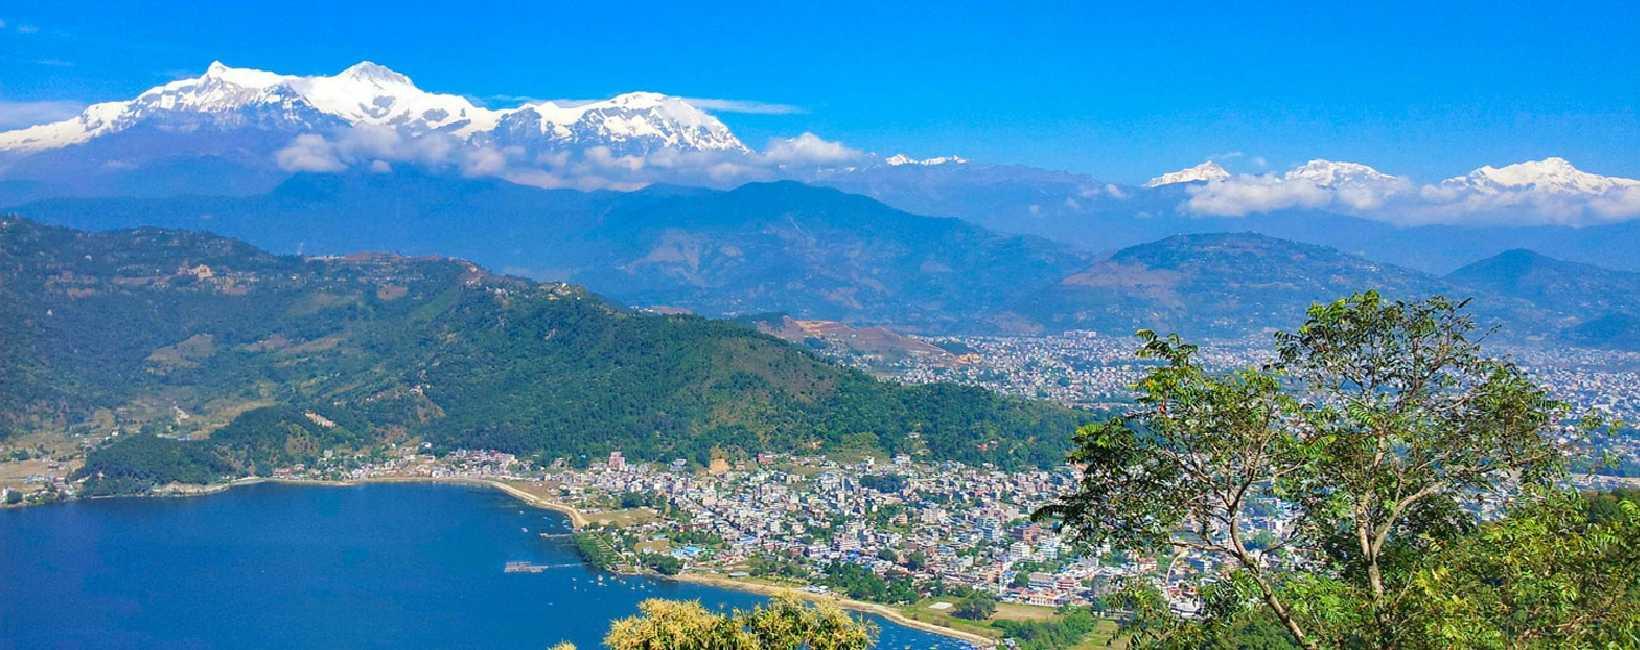 Kathmandu-Pokhara(5Night 6Days)